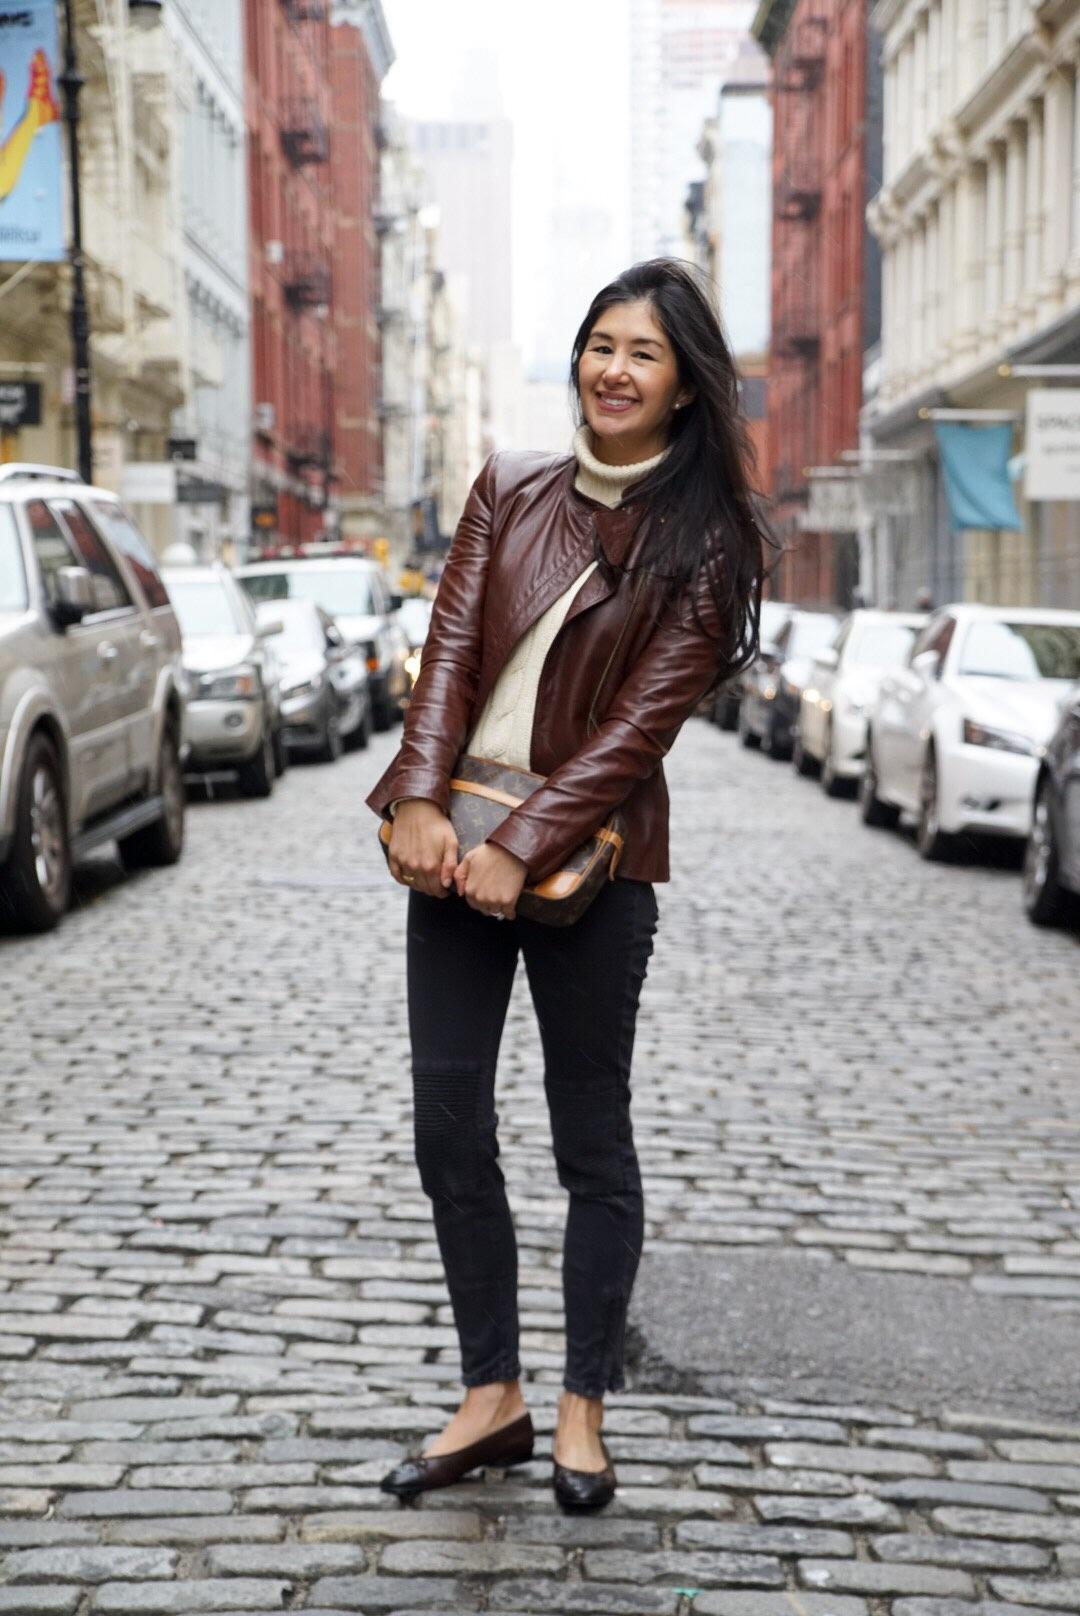 Soho New York Zara Leather Jacket Ralph Lauren Turtleneck Zara Moto Jeans Chanel Ballet Flats Louis Vuitton Clutch 4.jpg